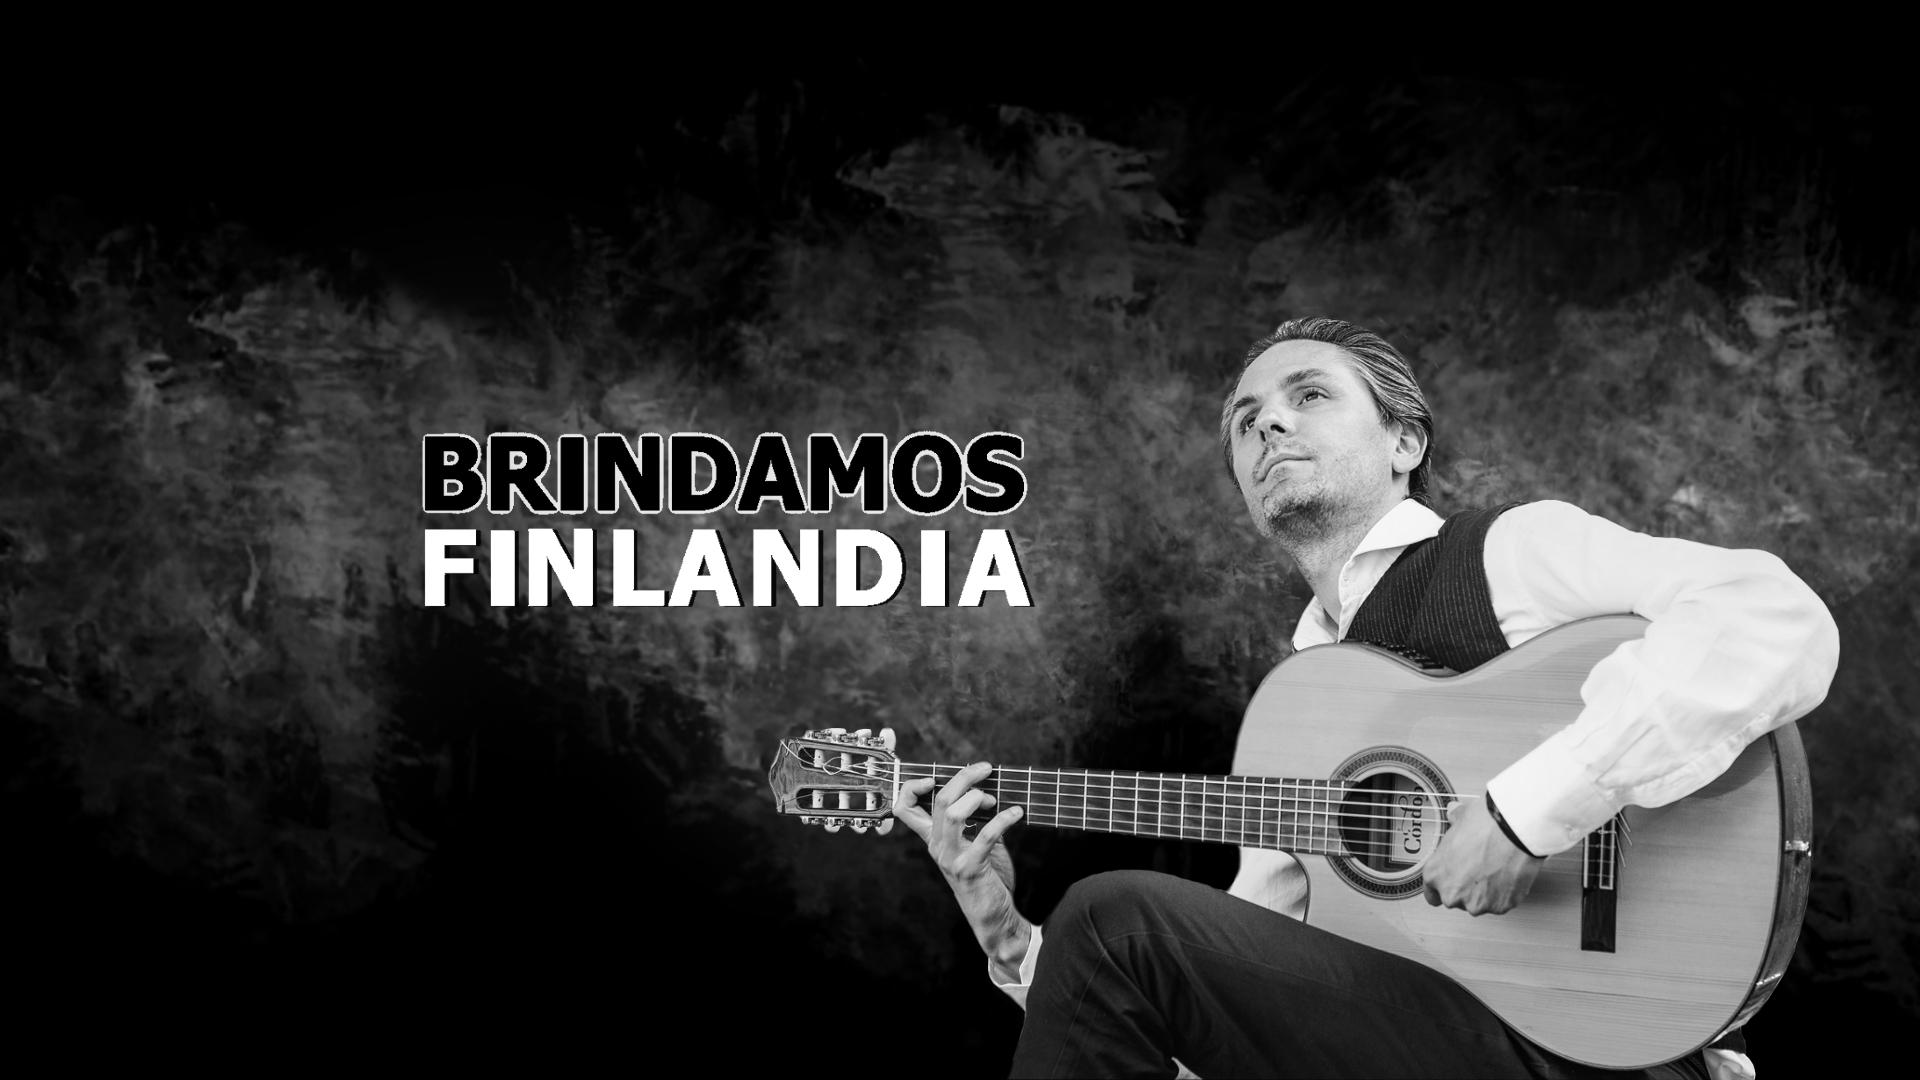 BRINDAMOS FINLANDIA EVENTS 2020 Juho